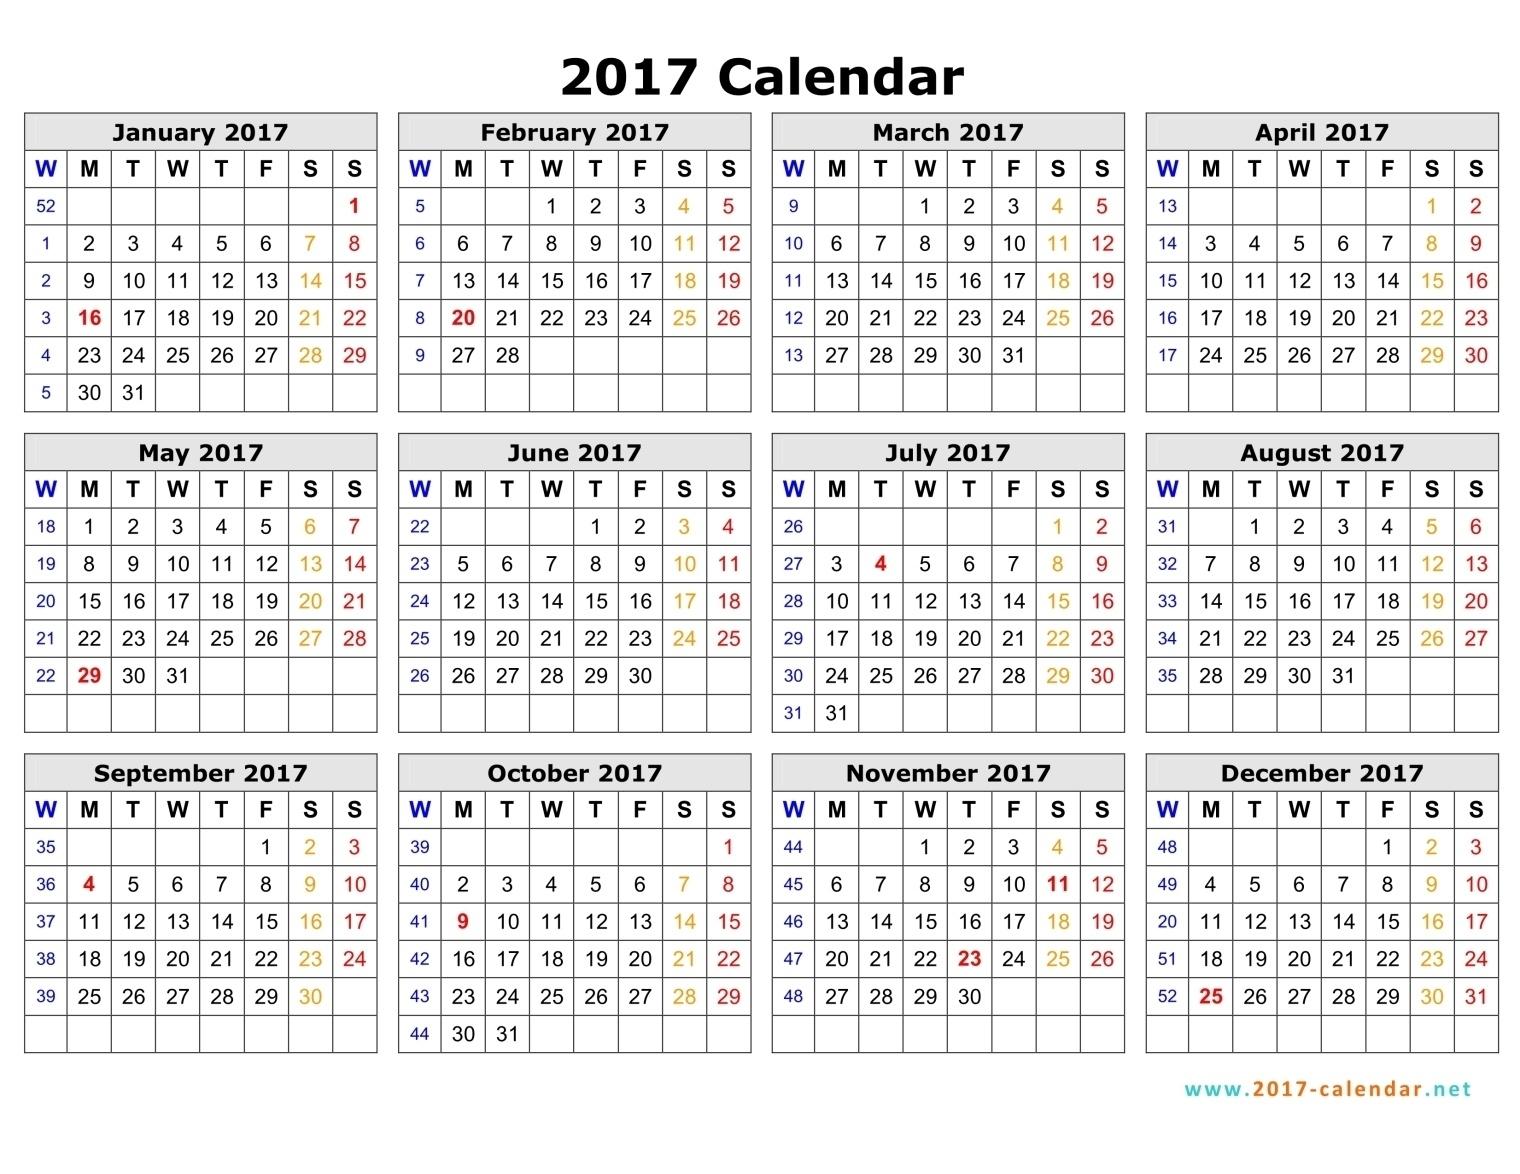 Printable 2017 Calendar  Weekly Calandar Template Starting Monday